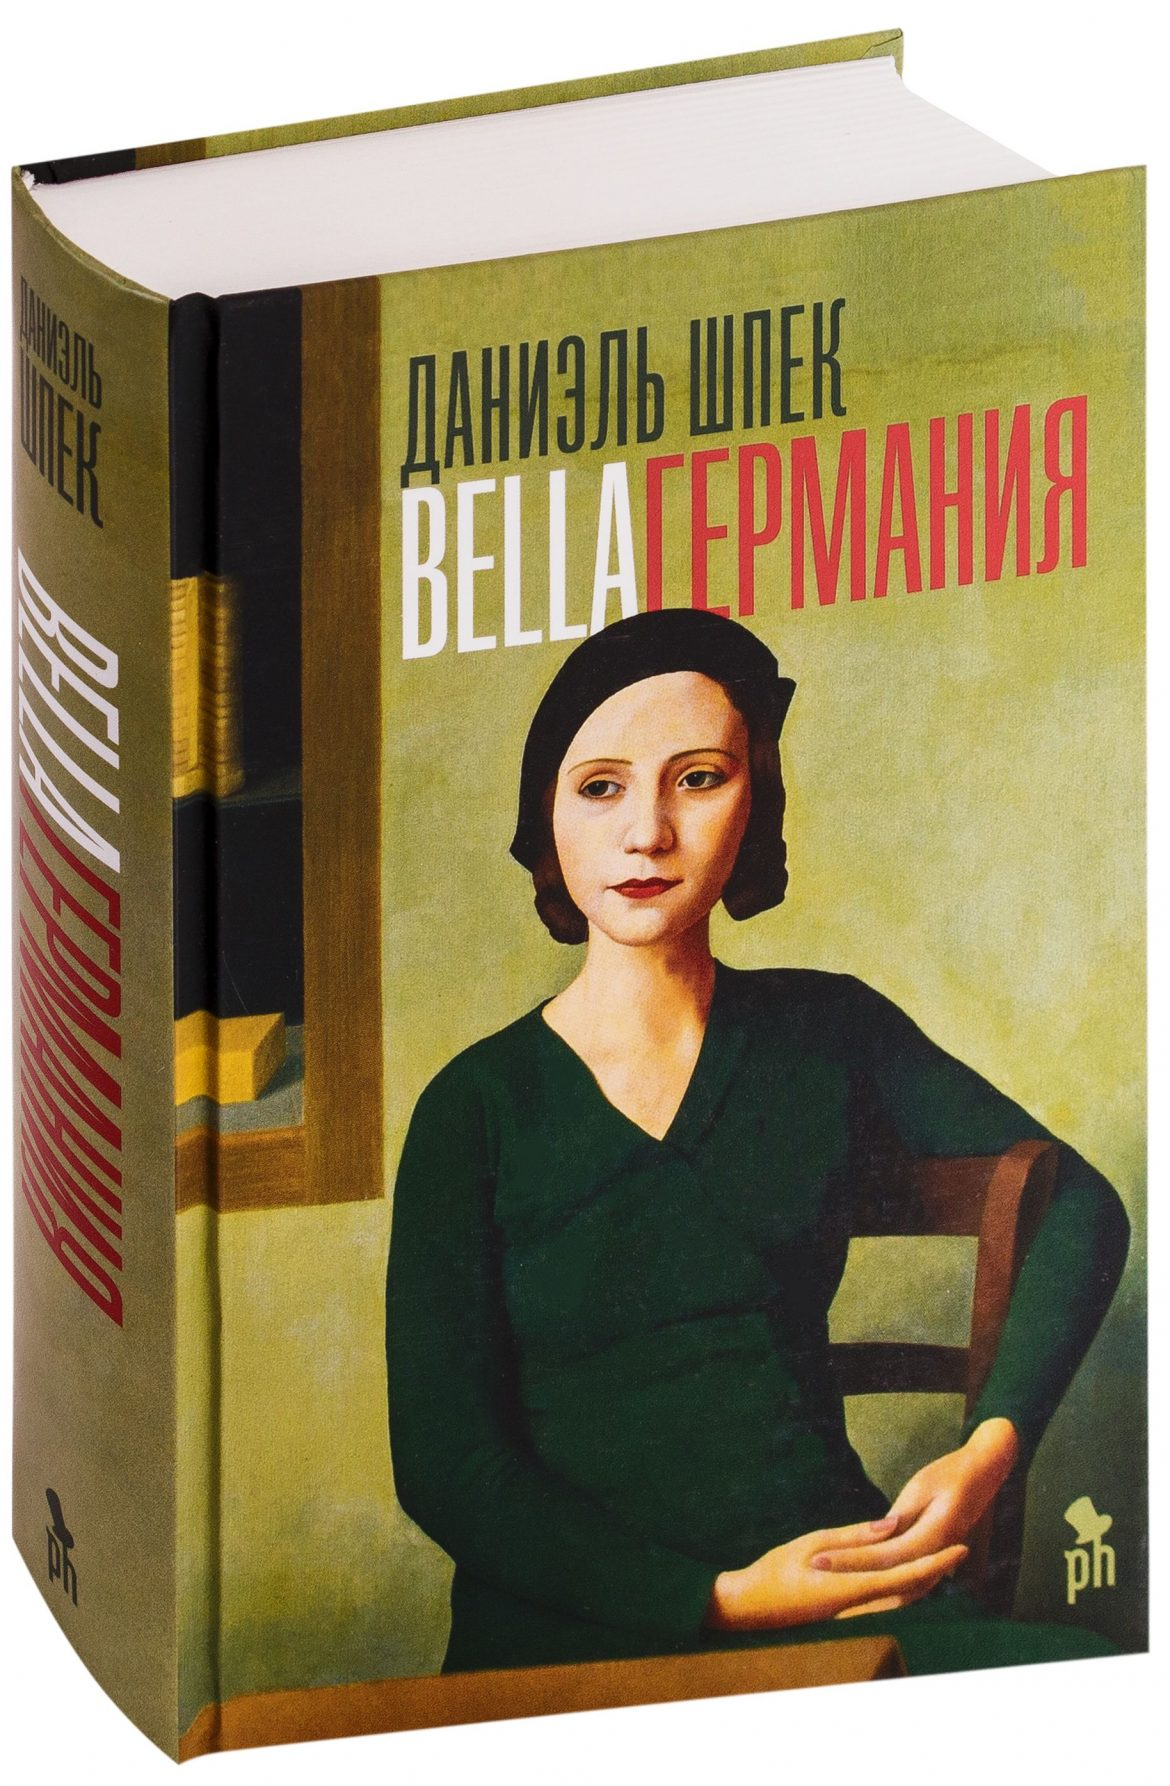 Bella Германия —  Даниэль Шпек